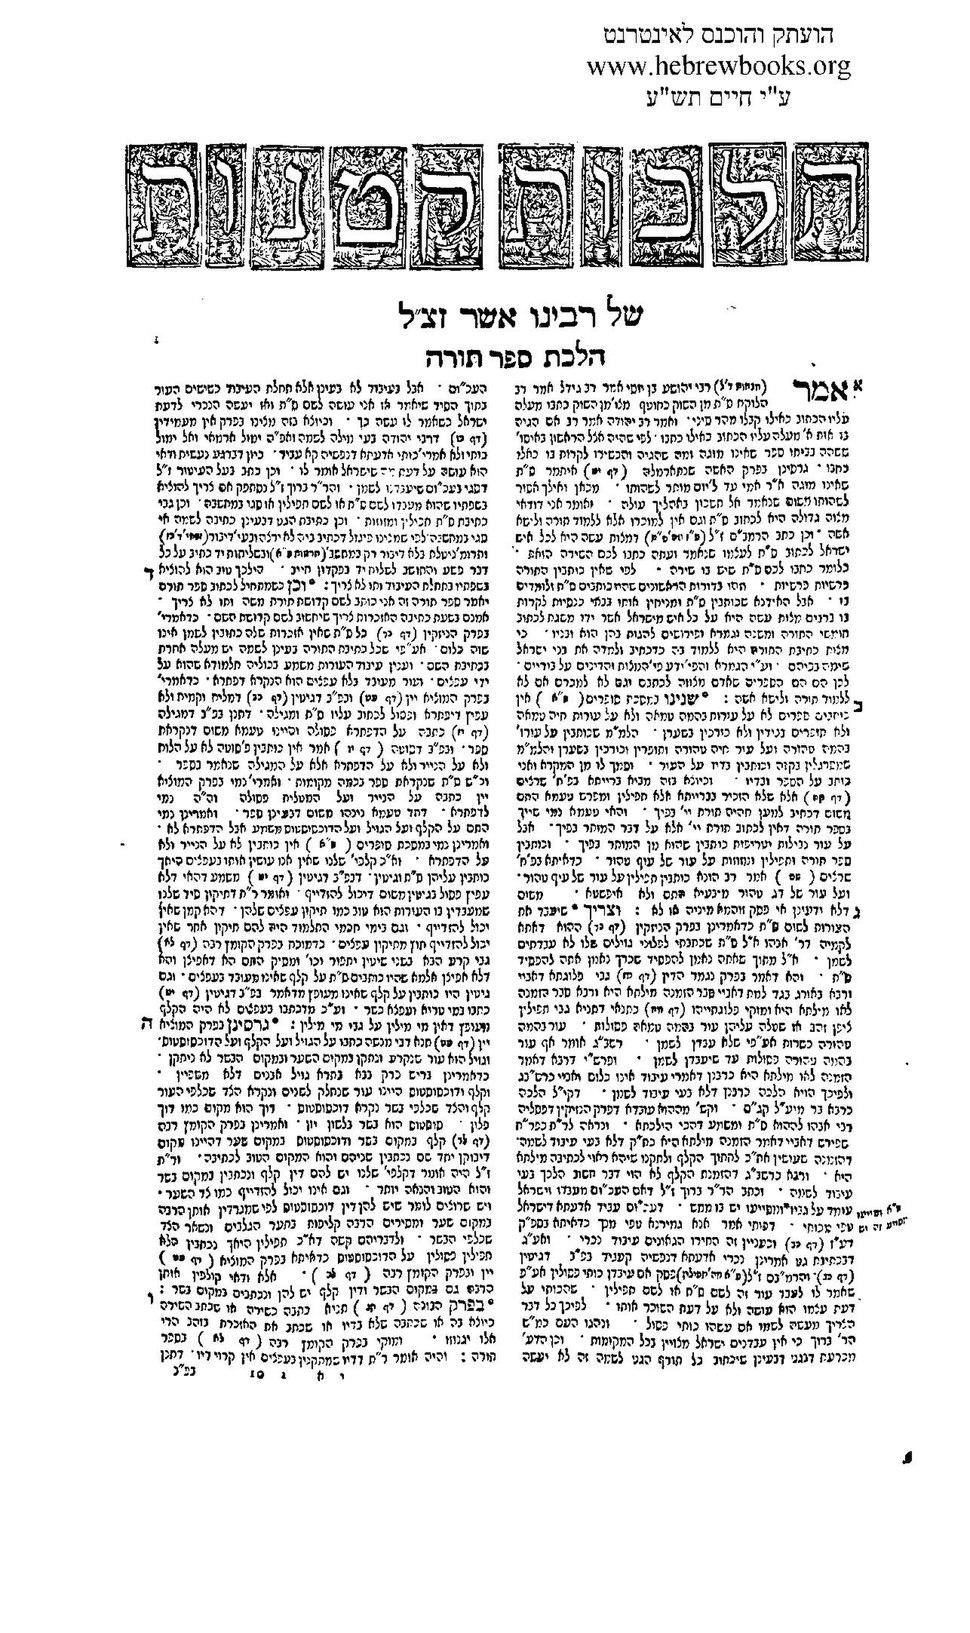 Halakhot-Ketanot-Rosh-Frankfurt-1720-HB42032.pdf